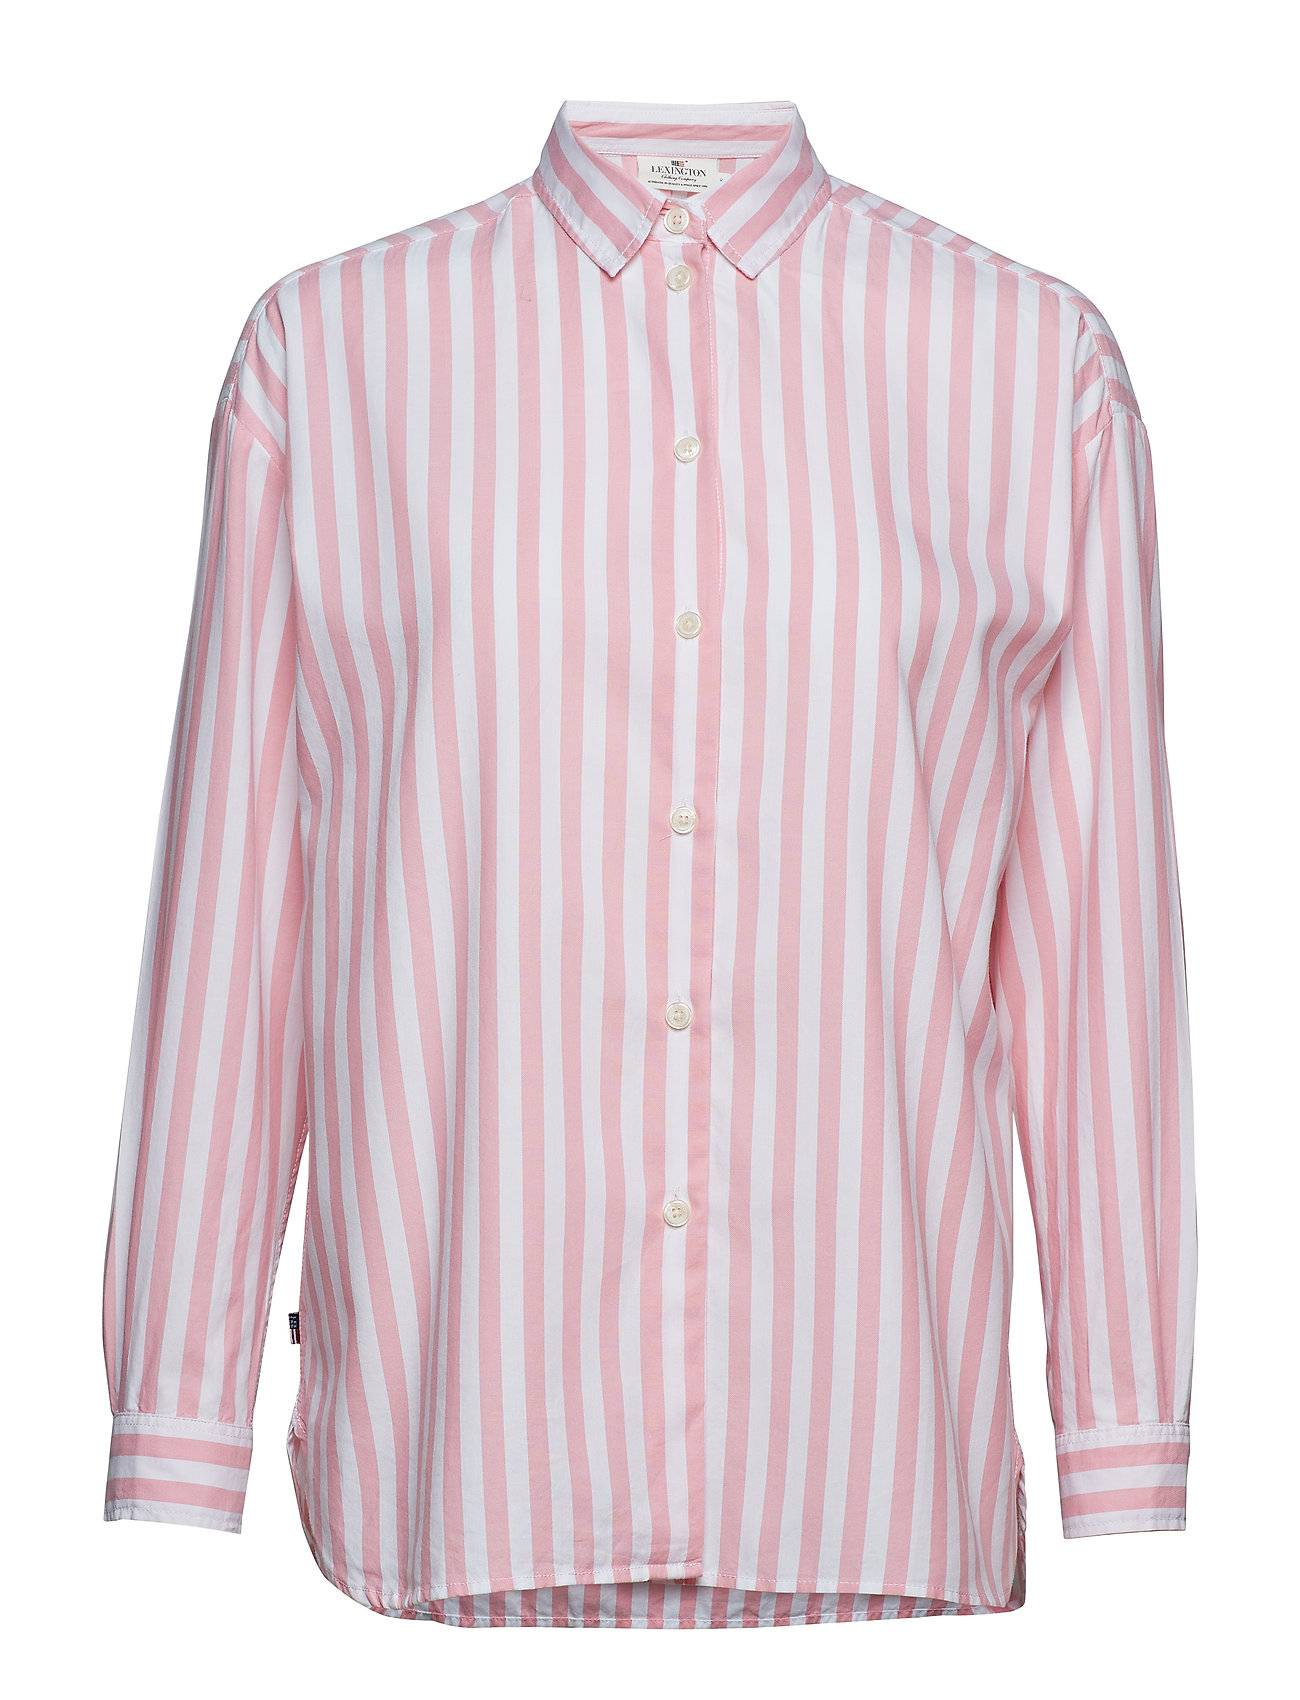 Lexington Clothing Edith Lt Oxford Shirt